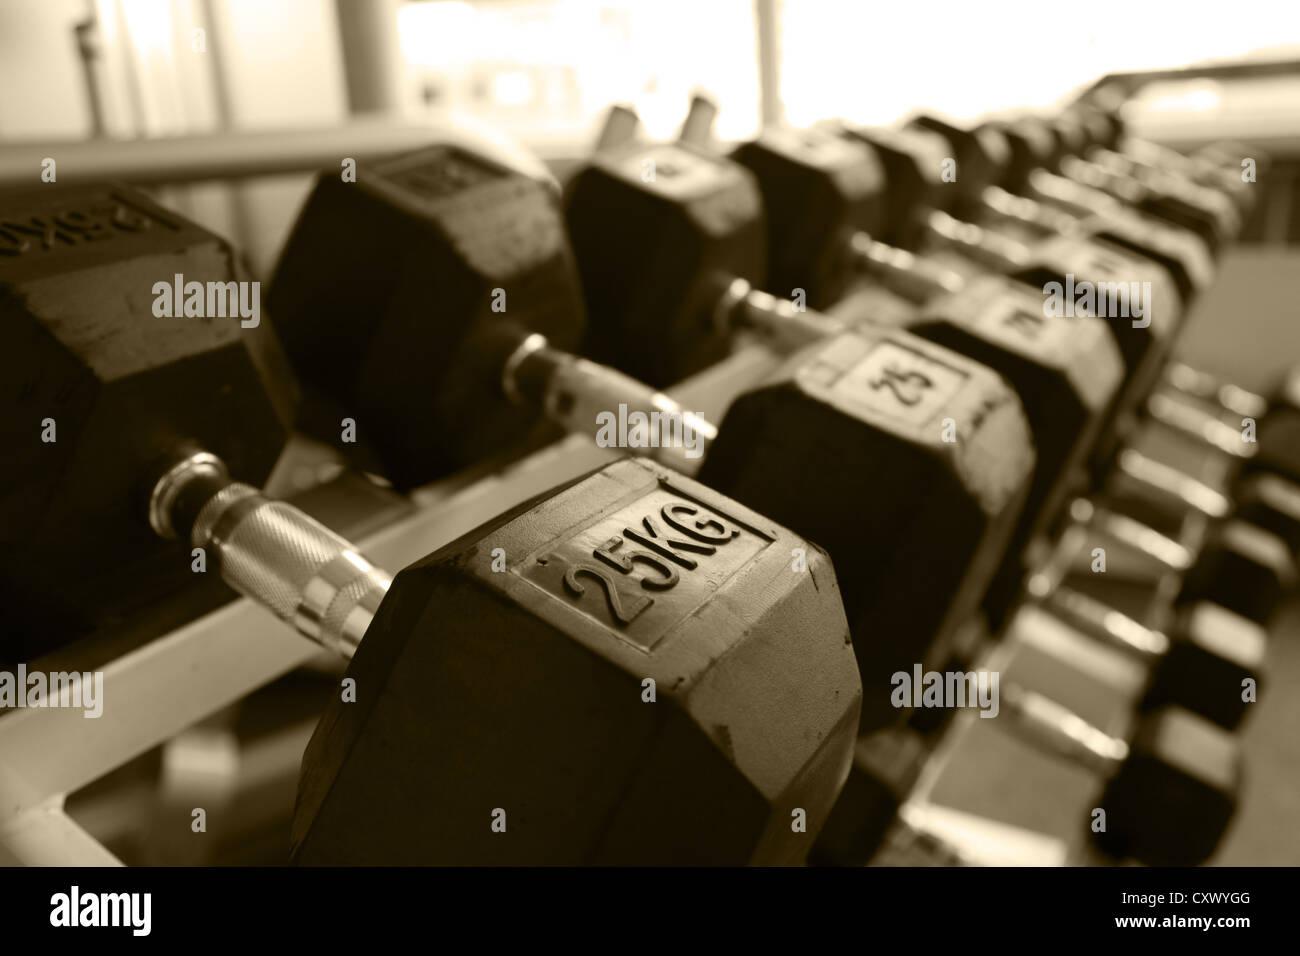 Pesa pesas gimnasio equipos para gimnasia Imagen De Stock